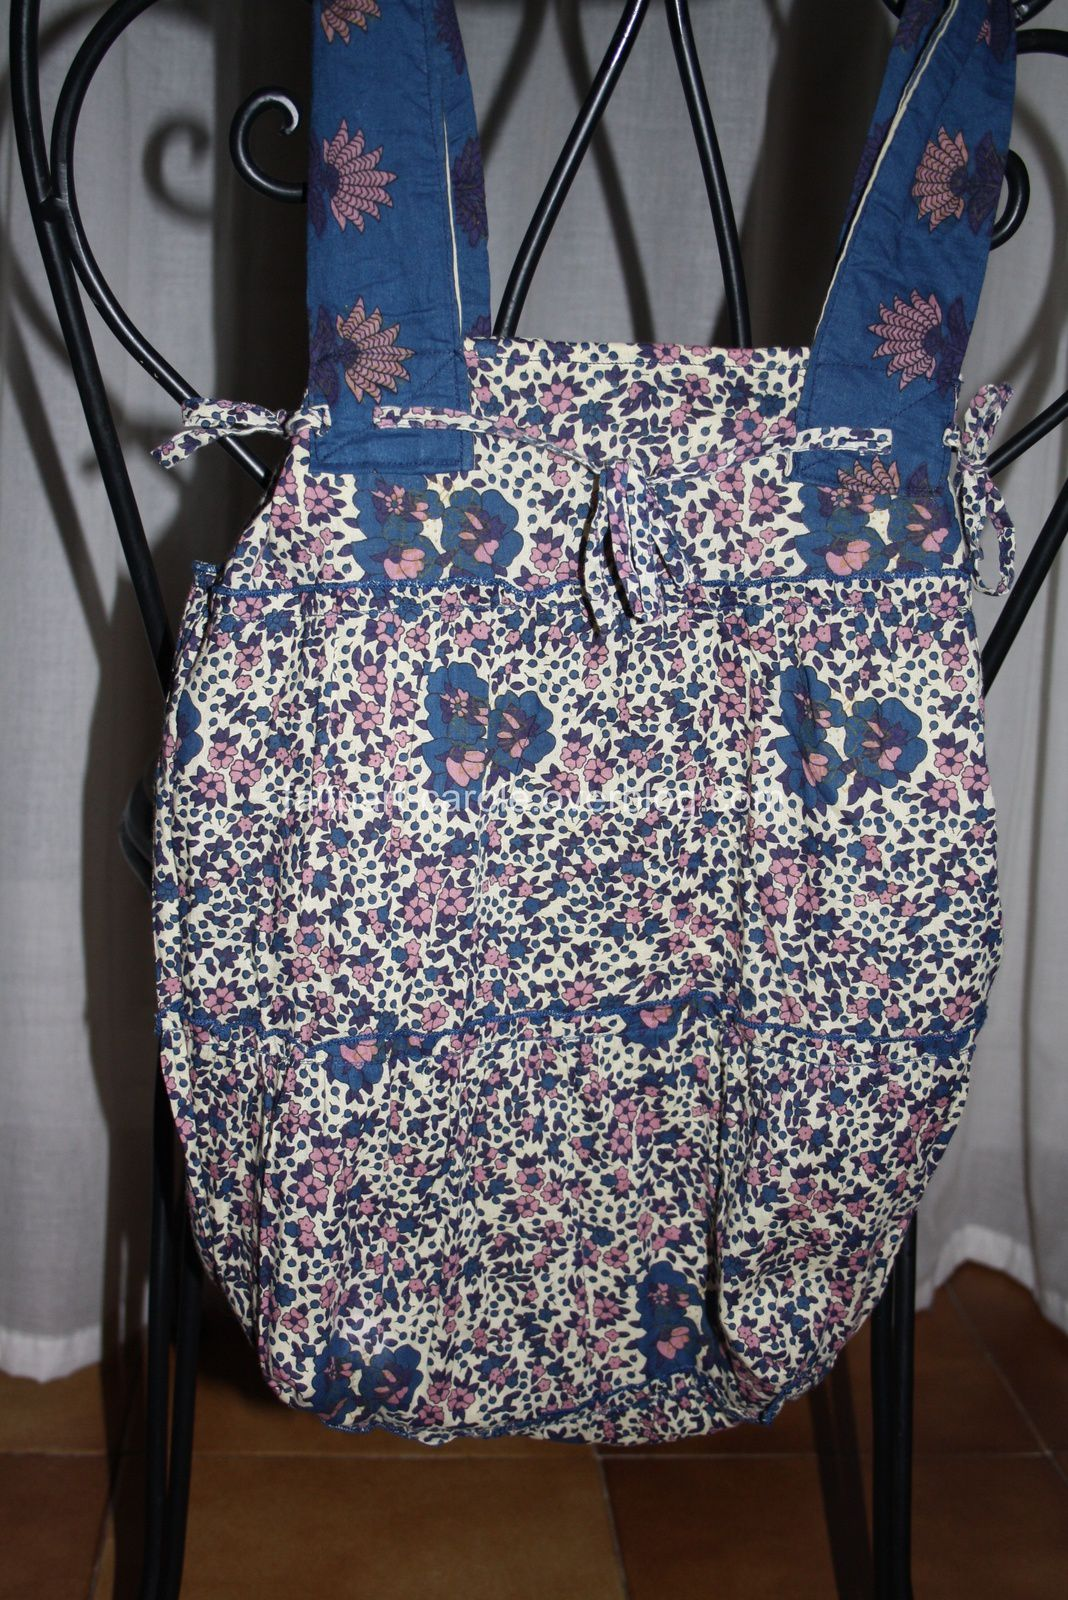 sac de courses tissu fleurs